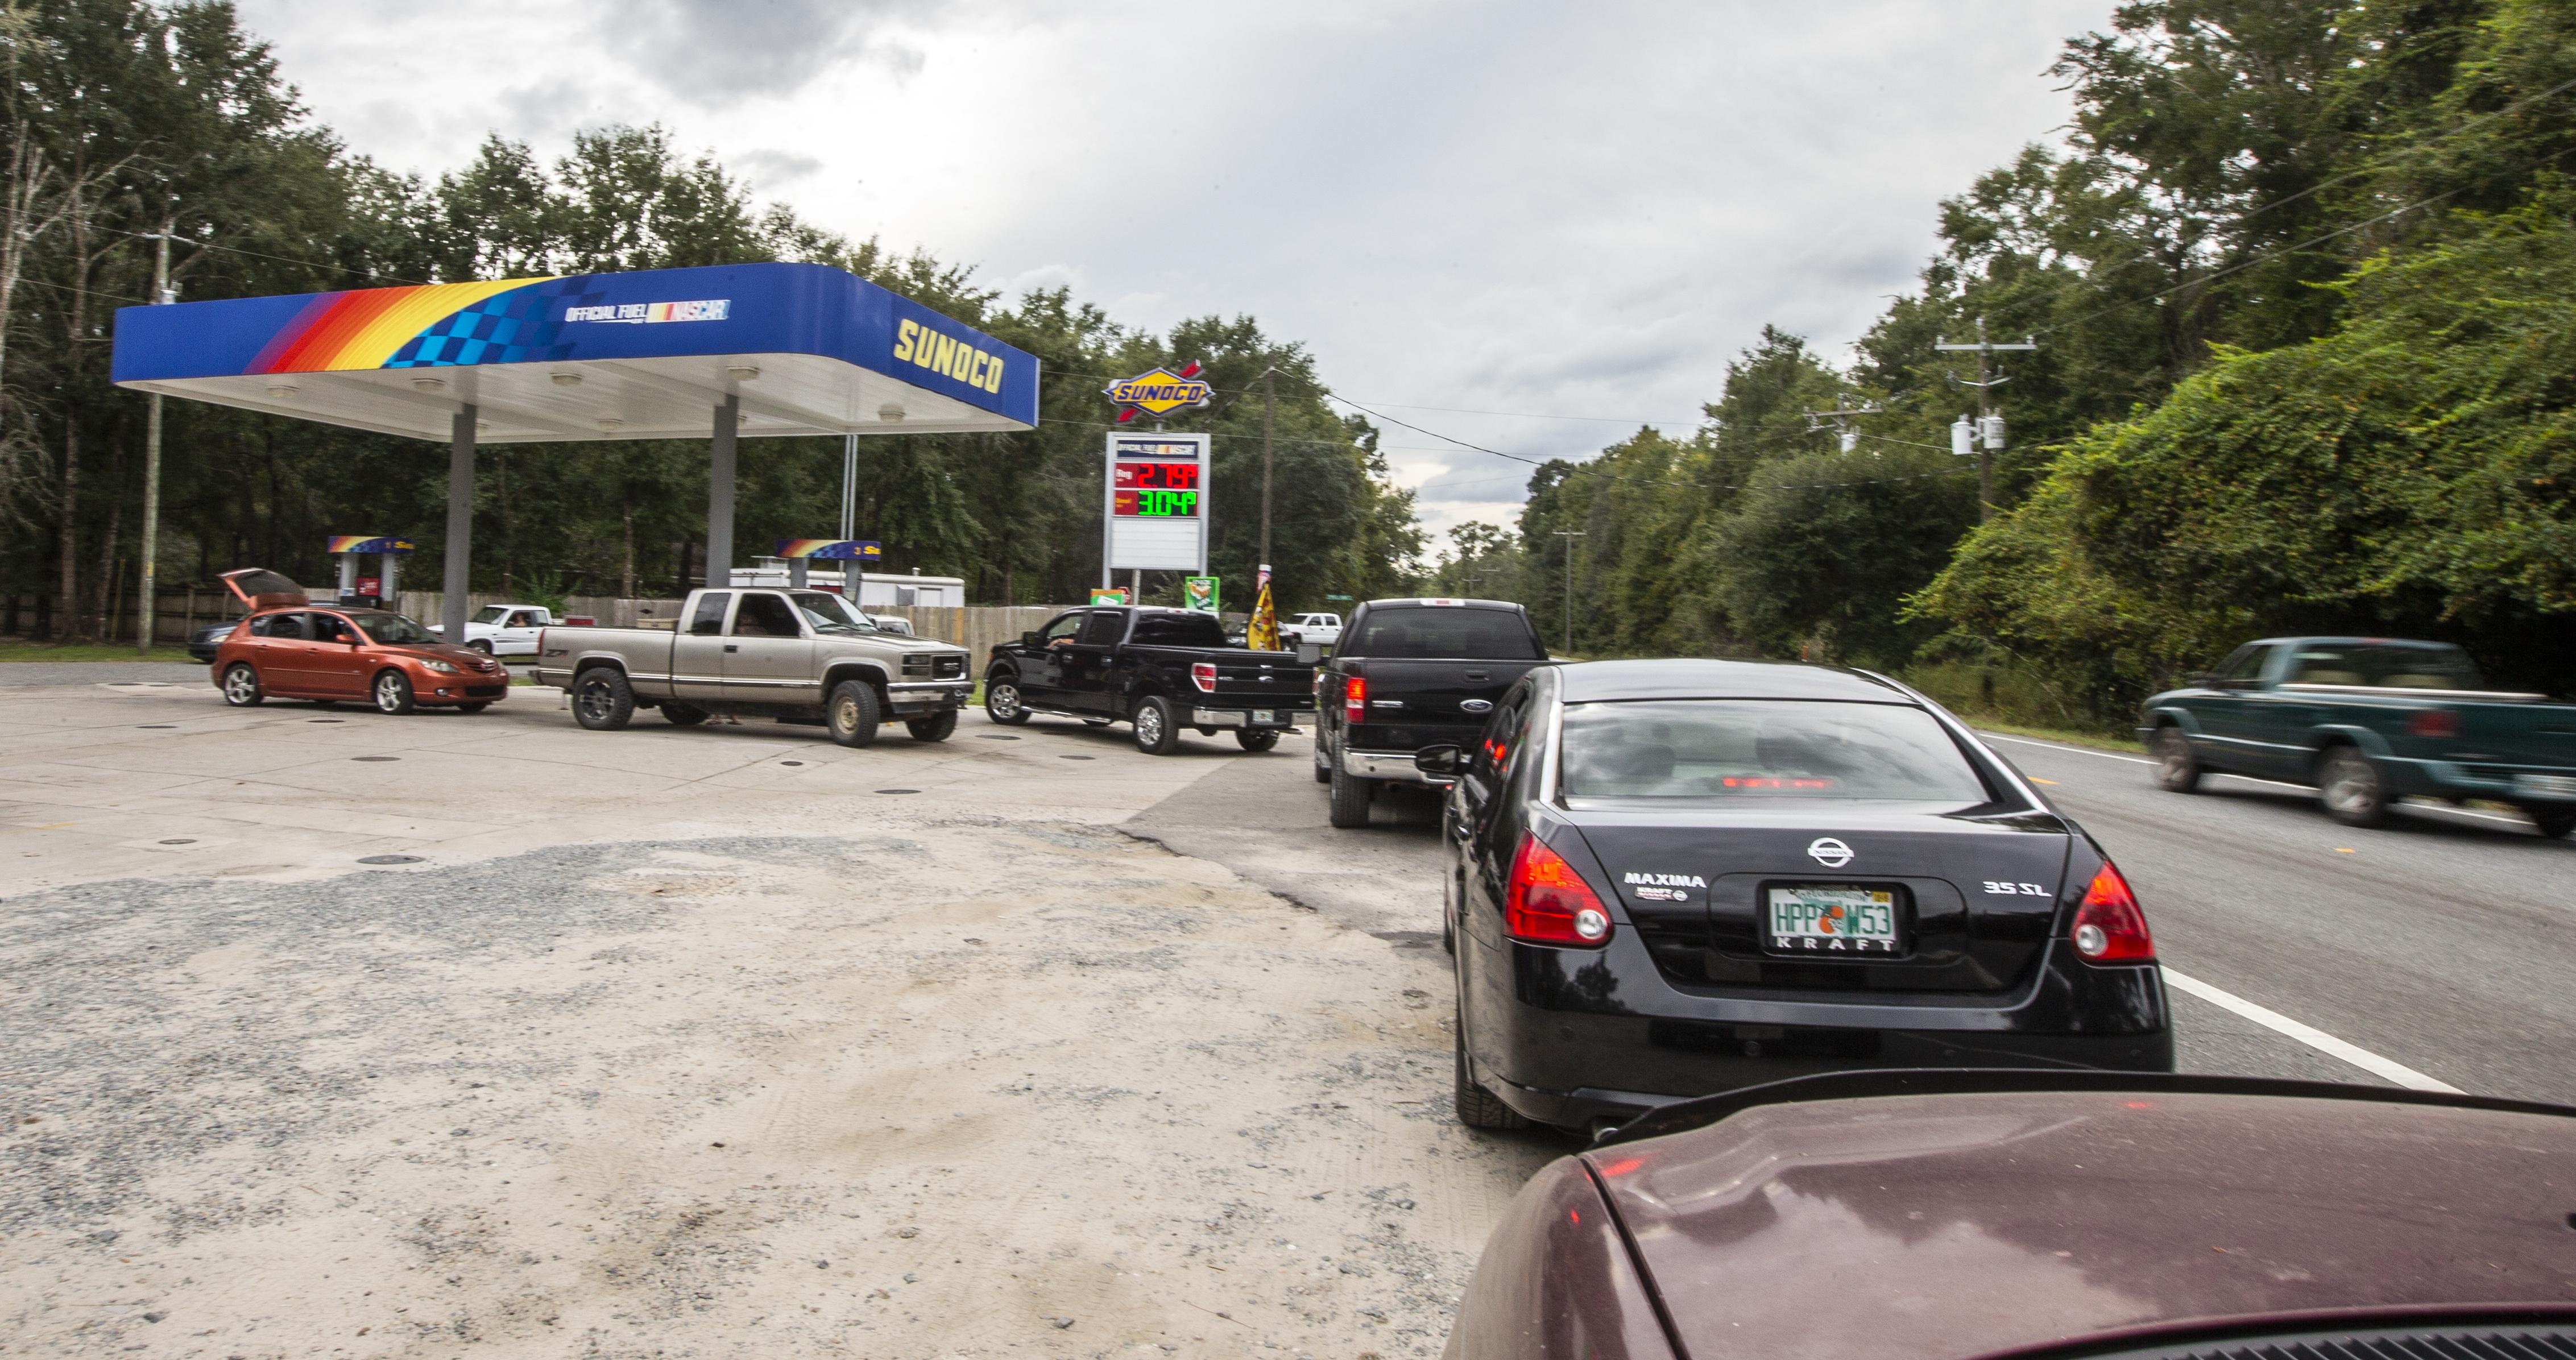 Conductores recargan combustible en Tallahassee, Florida, antes de la llegada del huracán (AFP)